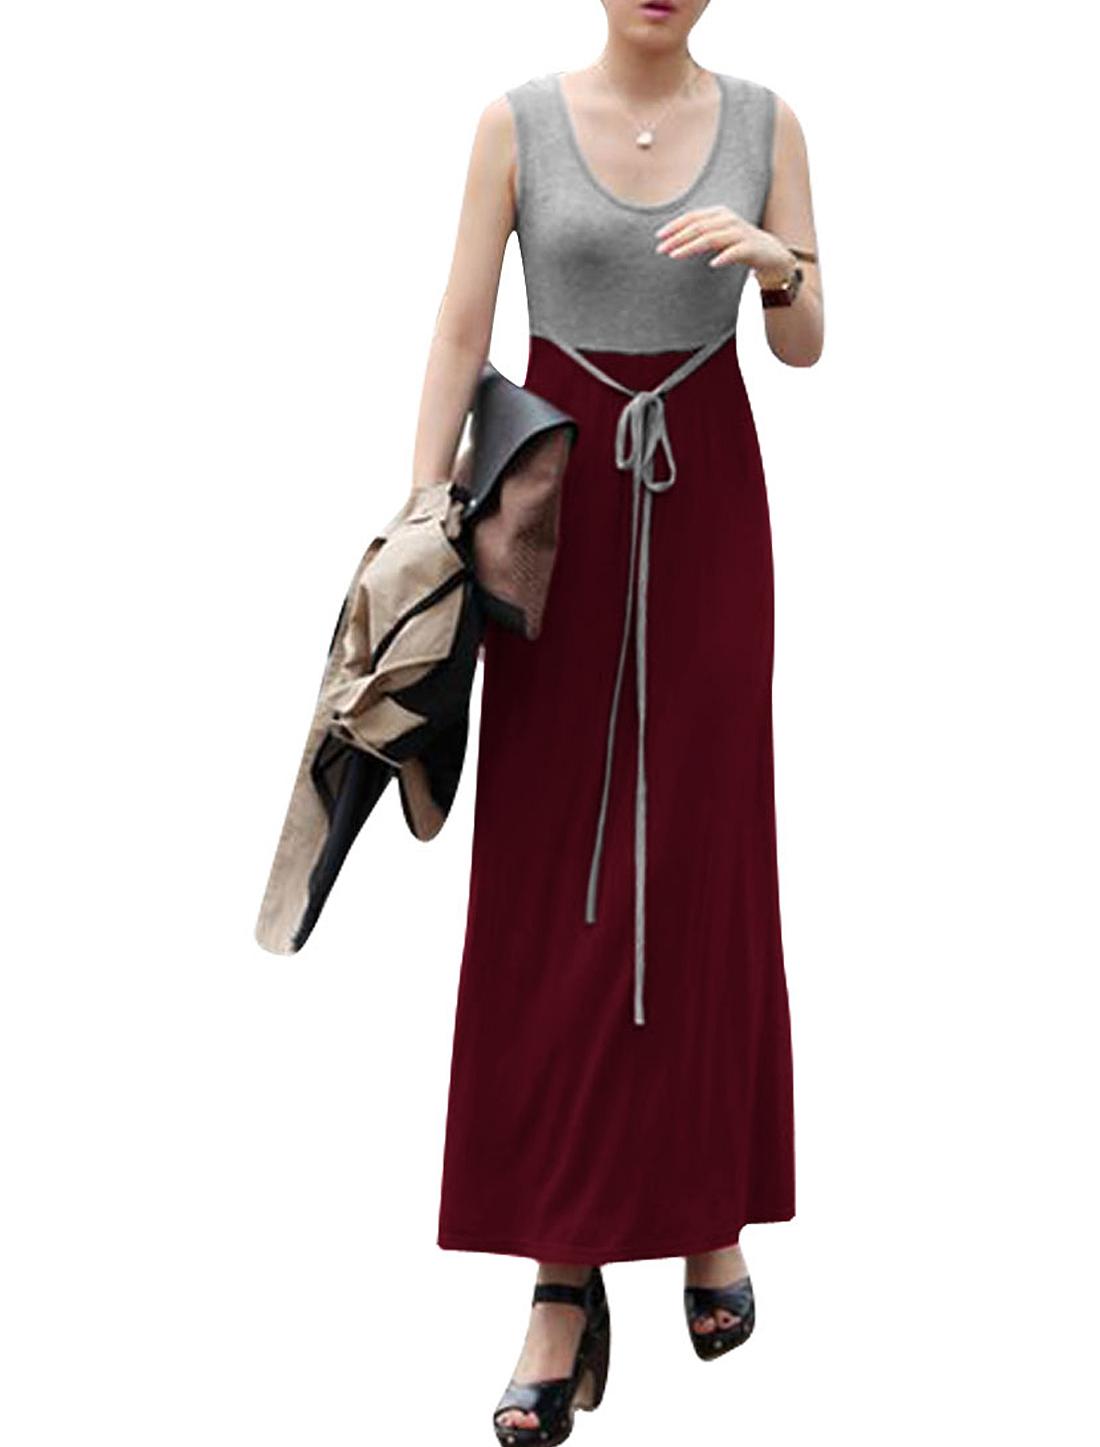 Burgundy XS Splice Style Pullover Round Hem Sleeveless Dress for Ladies